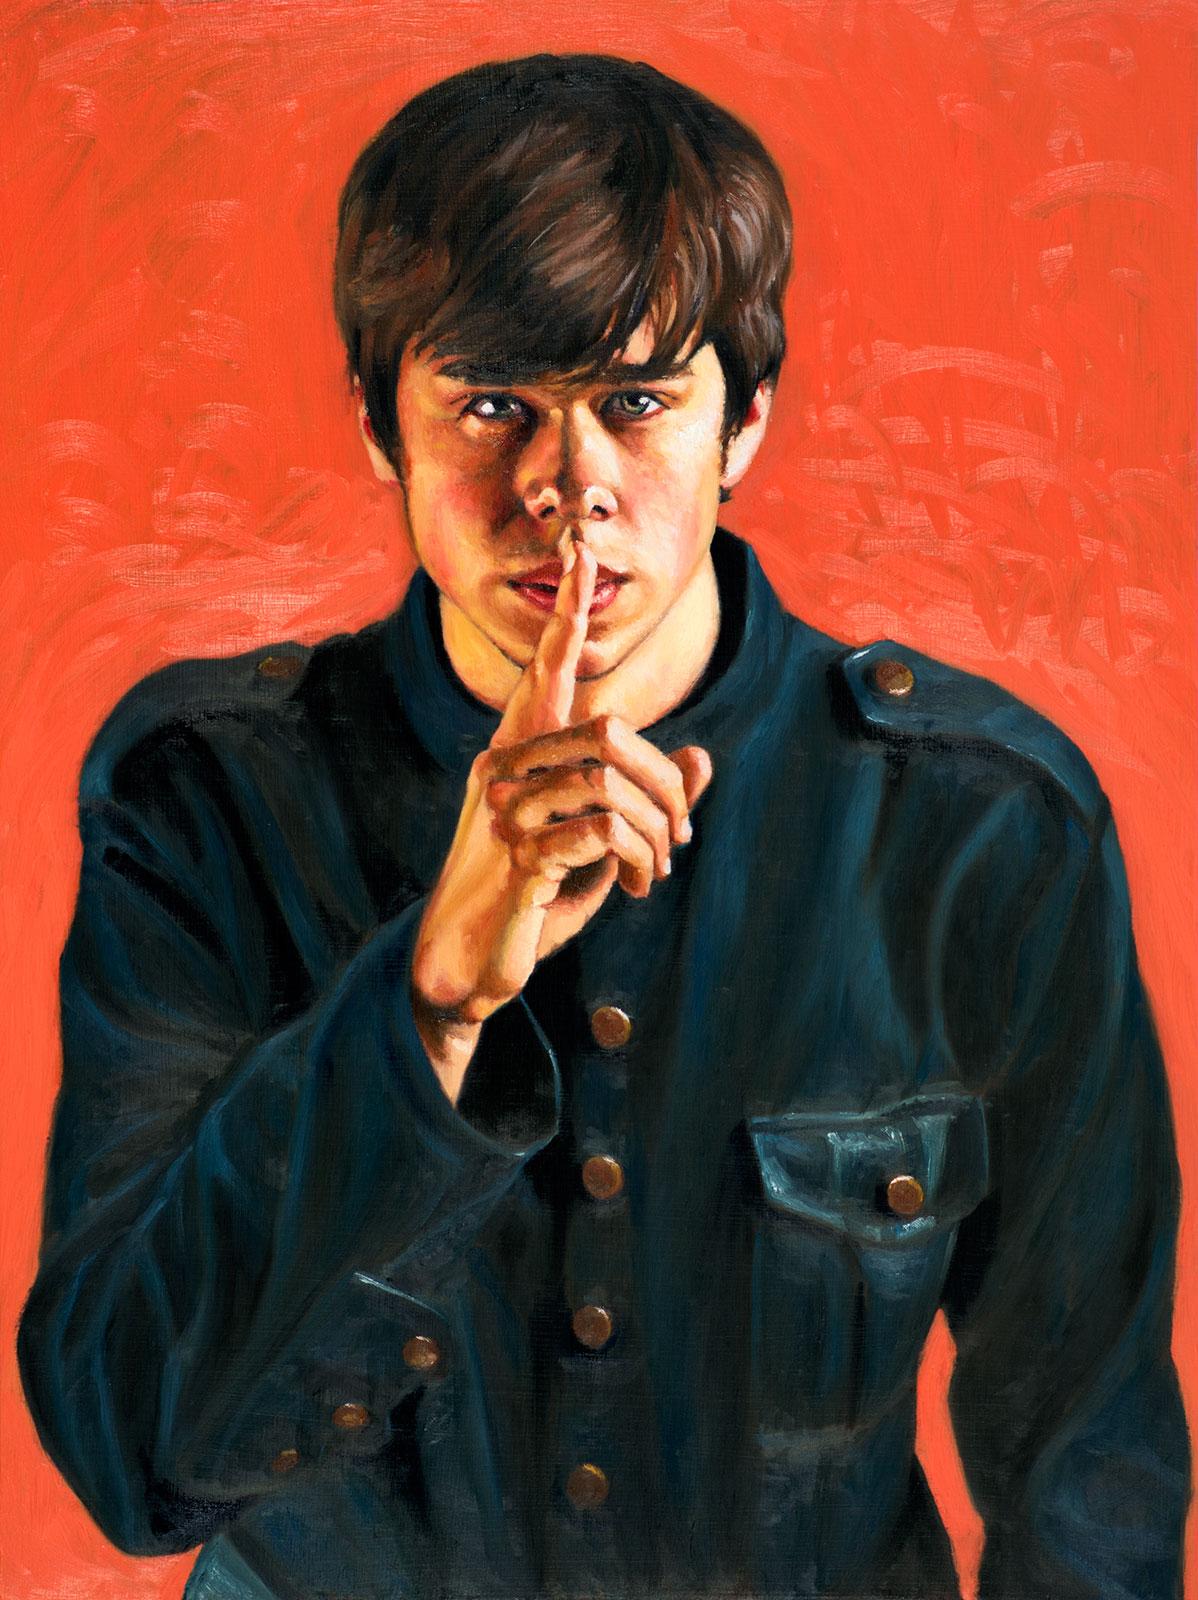 Shh (Josh)